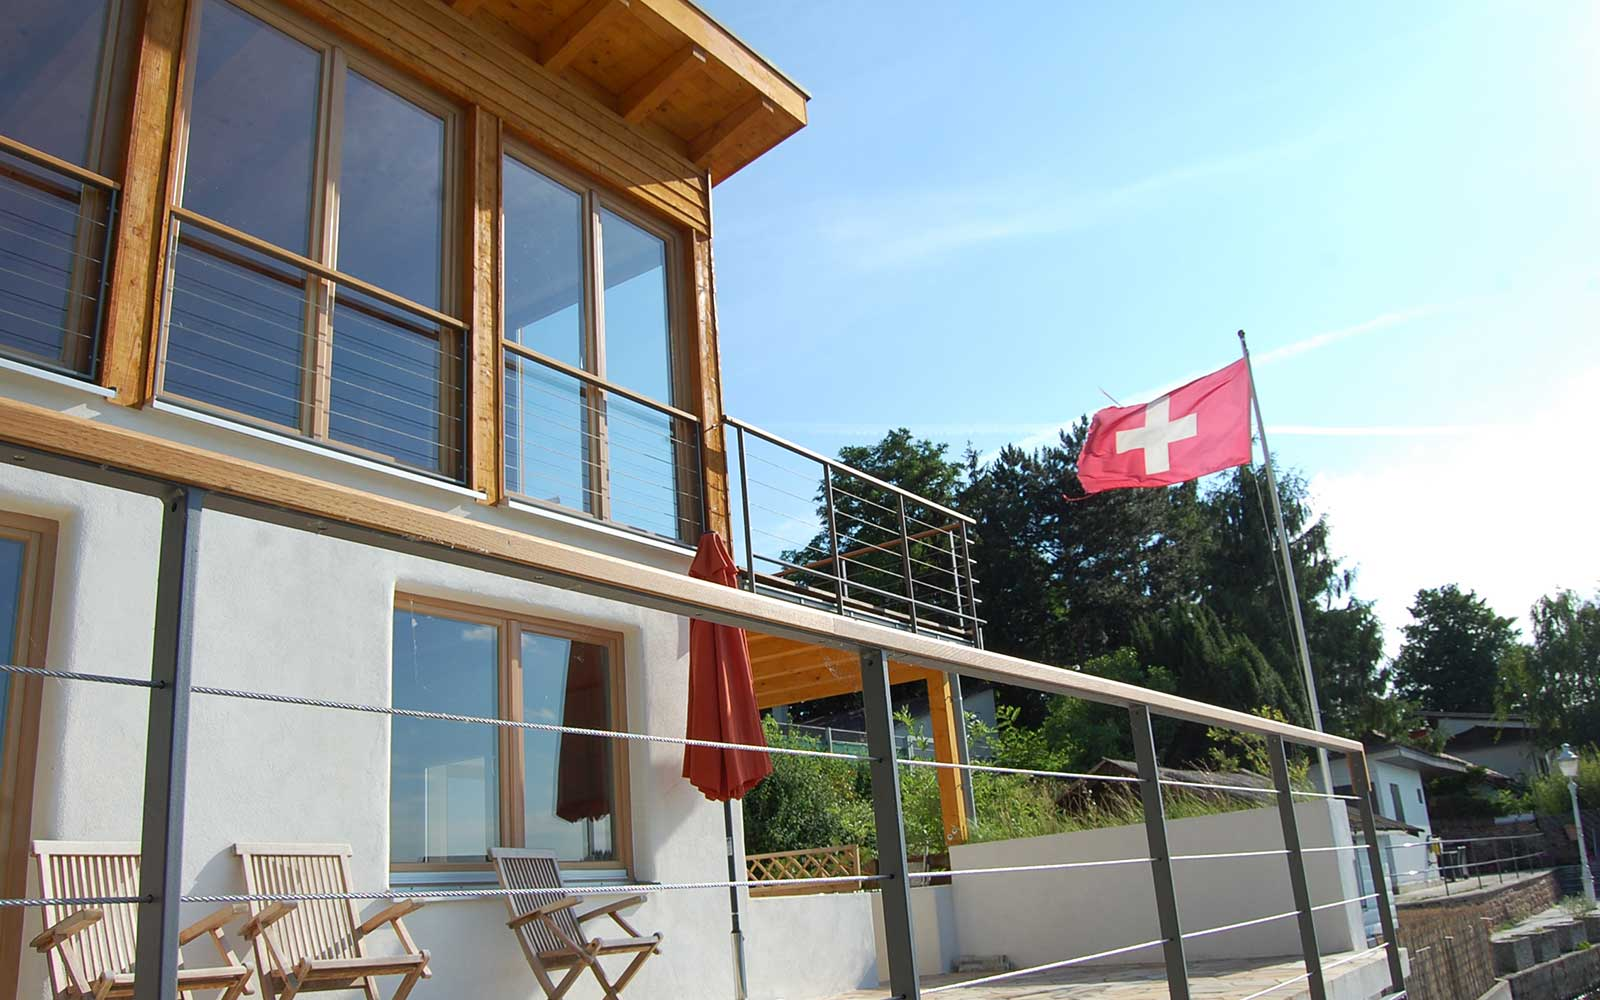 Blaue Adria Altrip, Architekturbüro Kochhan und Weckbach